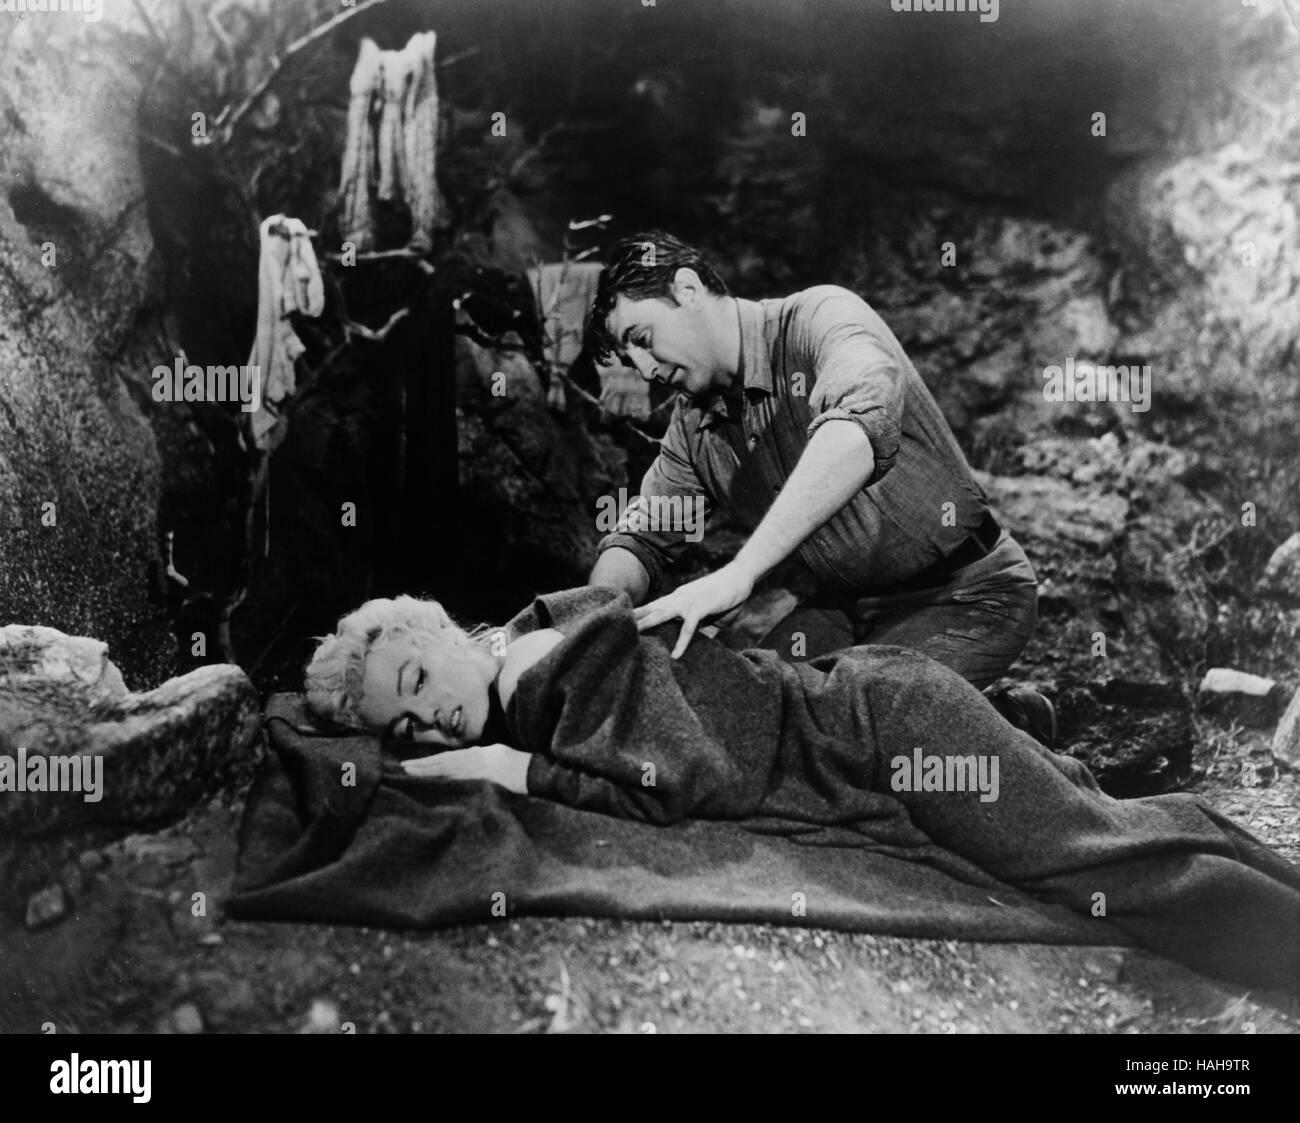 River of No Return  Year : 1954 USA Director : Otto Preminger Robert Mitchum, Marilyn Monroe - Stock Image